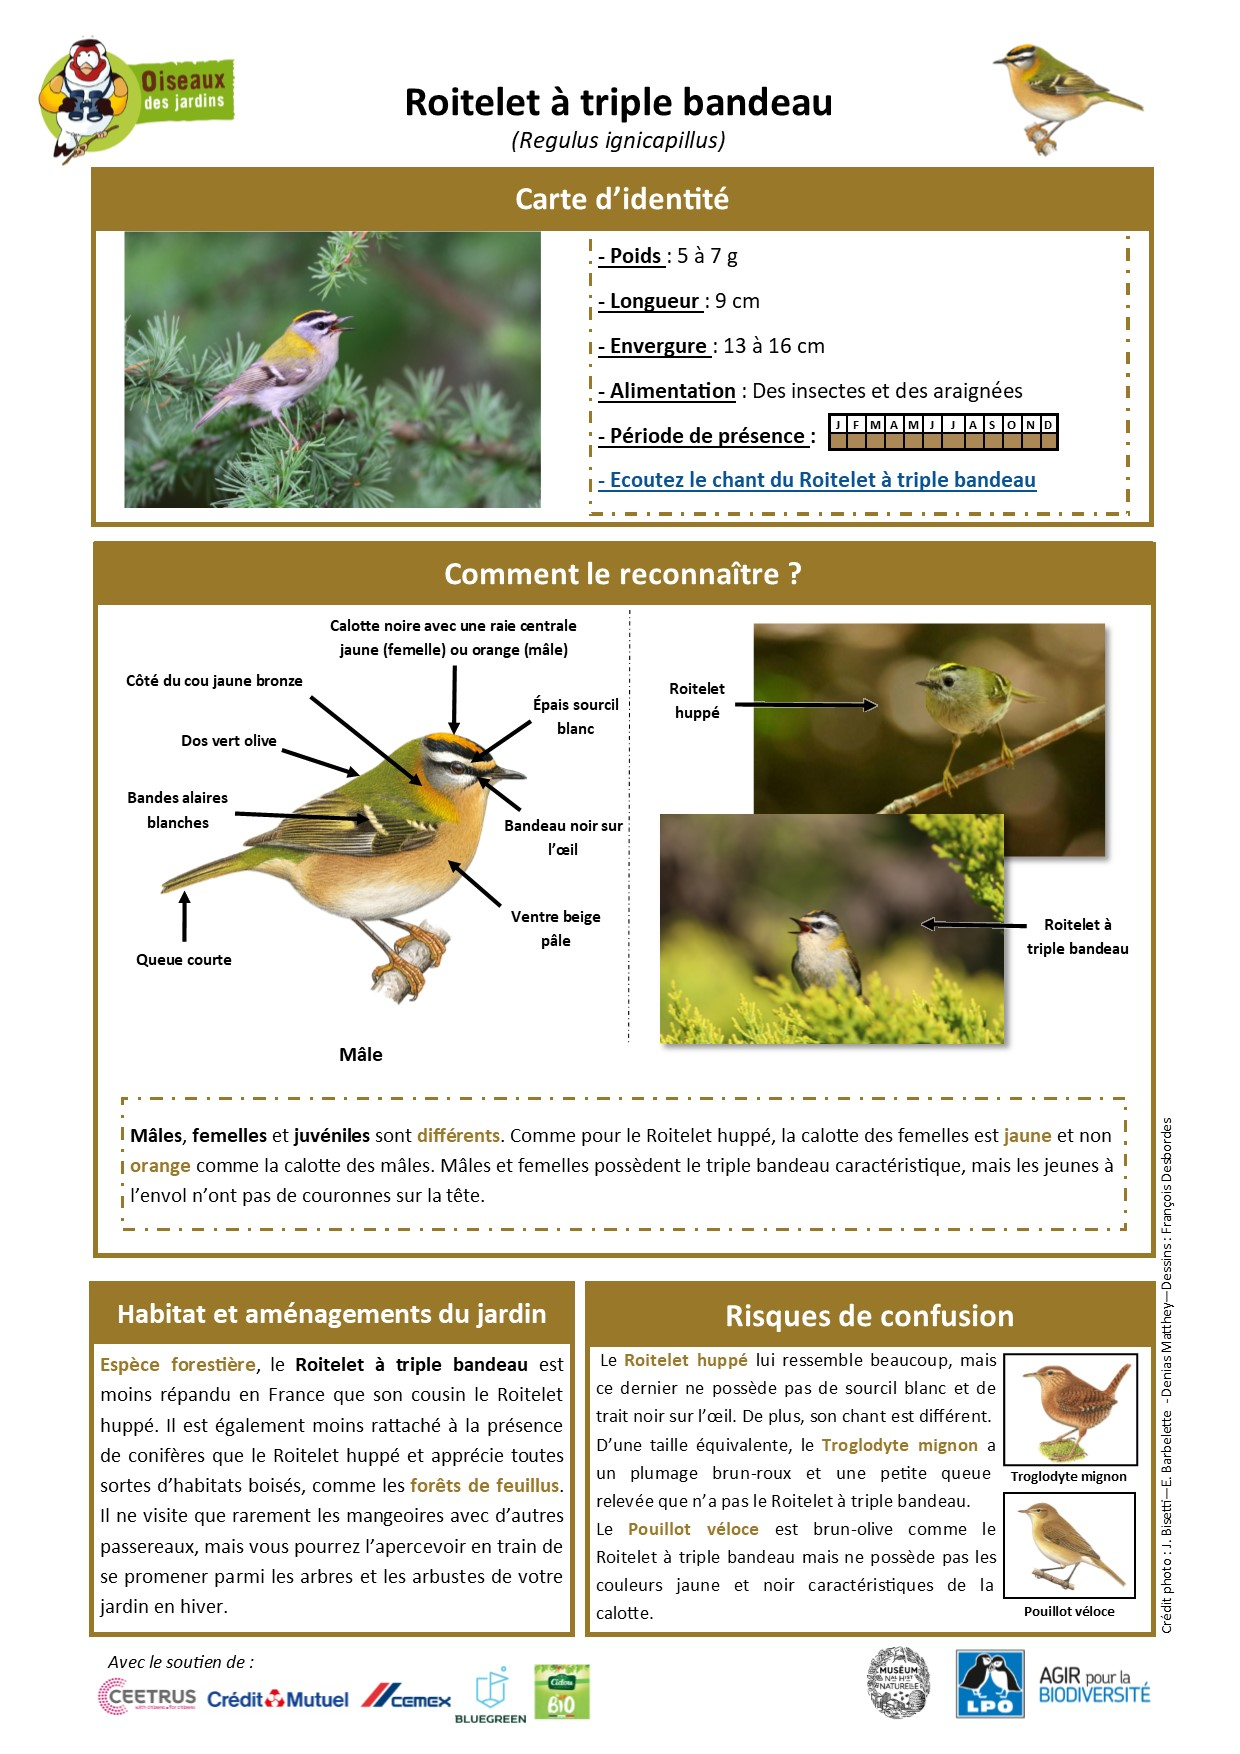 https://cdnfiles2.biolovision.net/www.oiseauxdesjardins.fr/userfiles/Fichesespces/FicheespceRTB.jpg